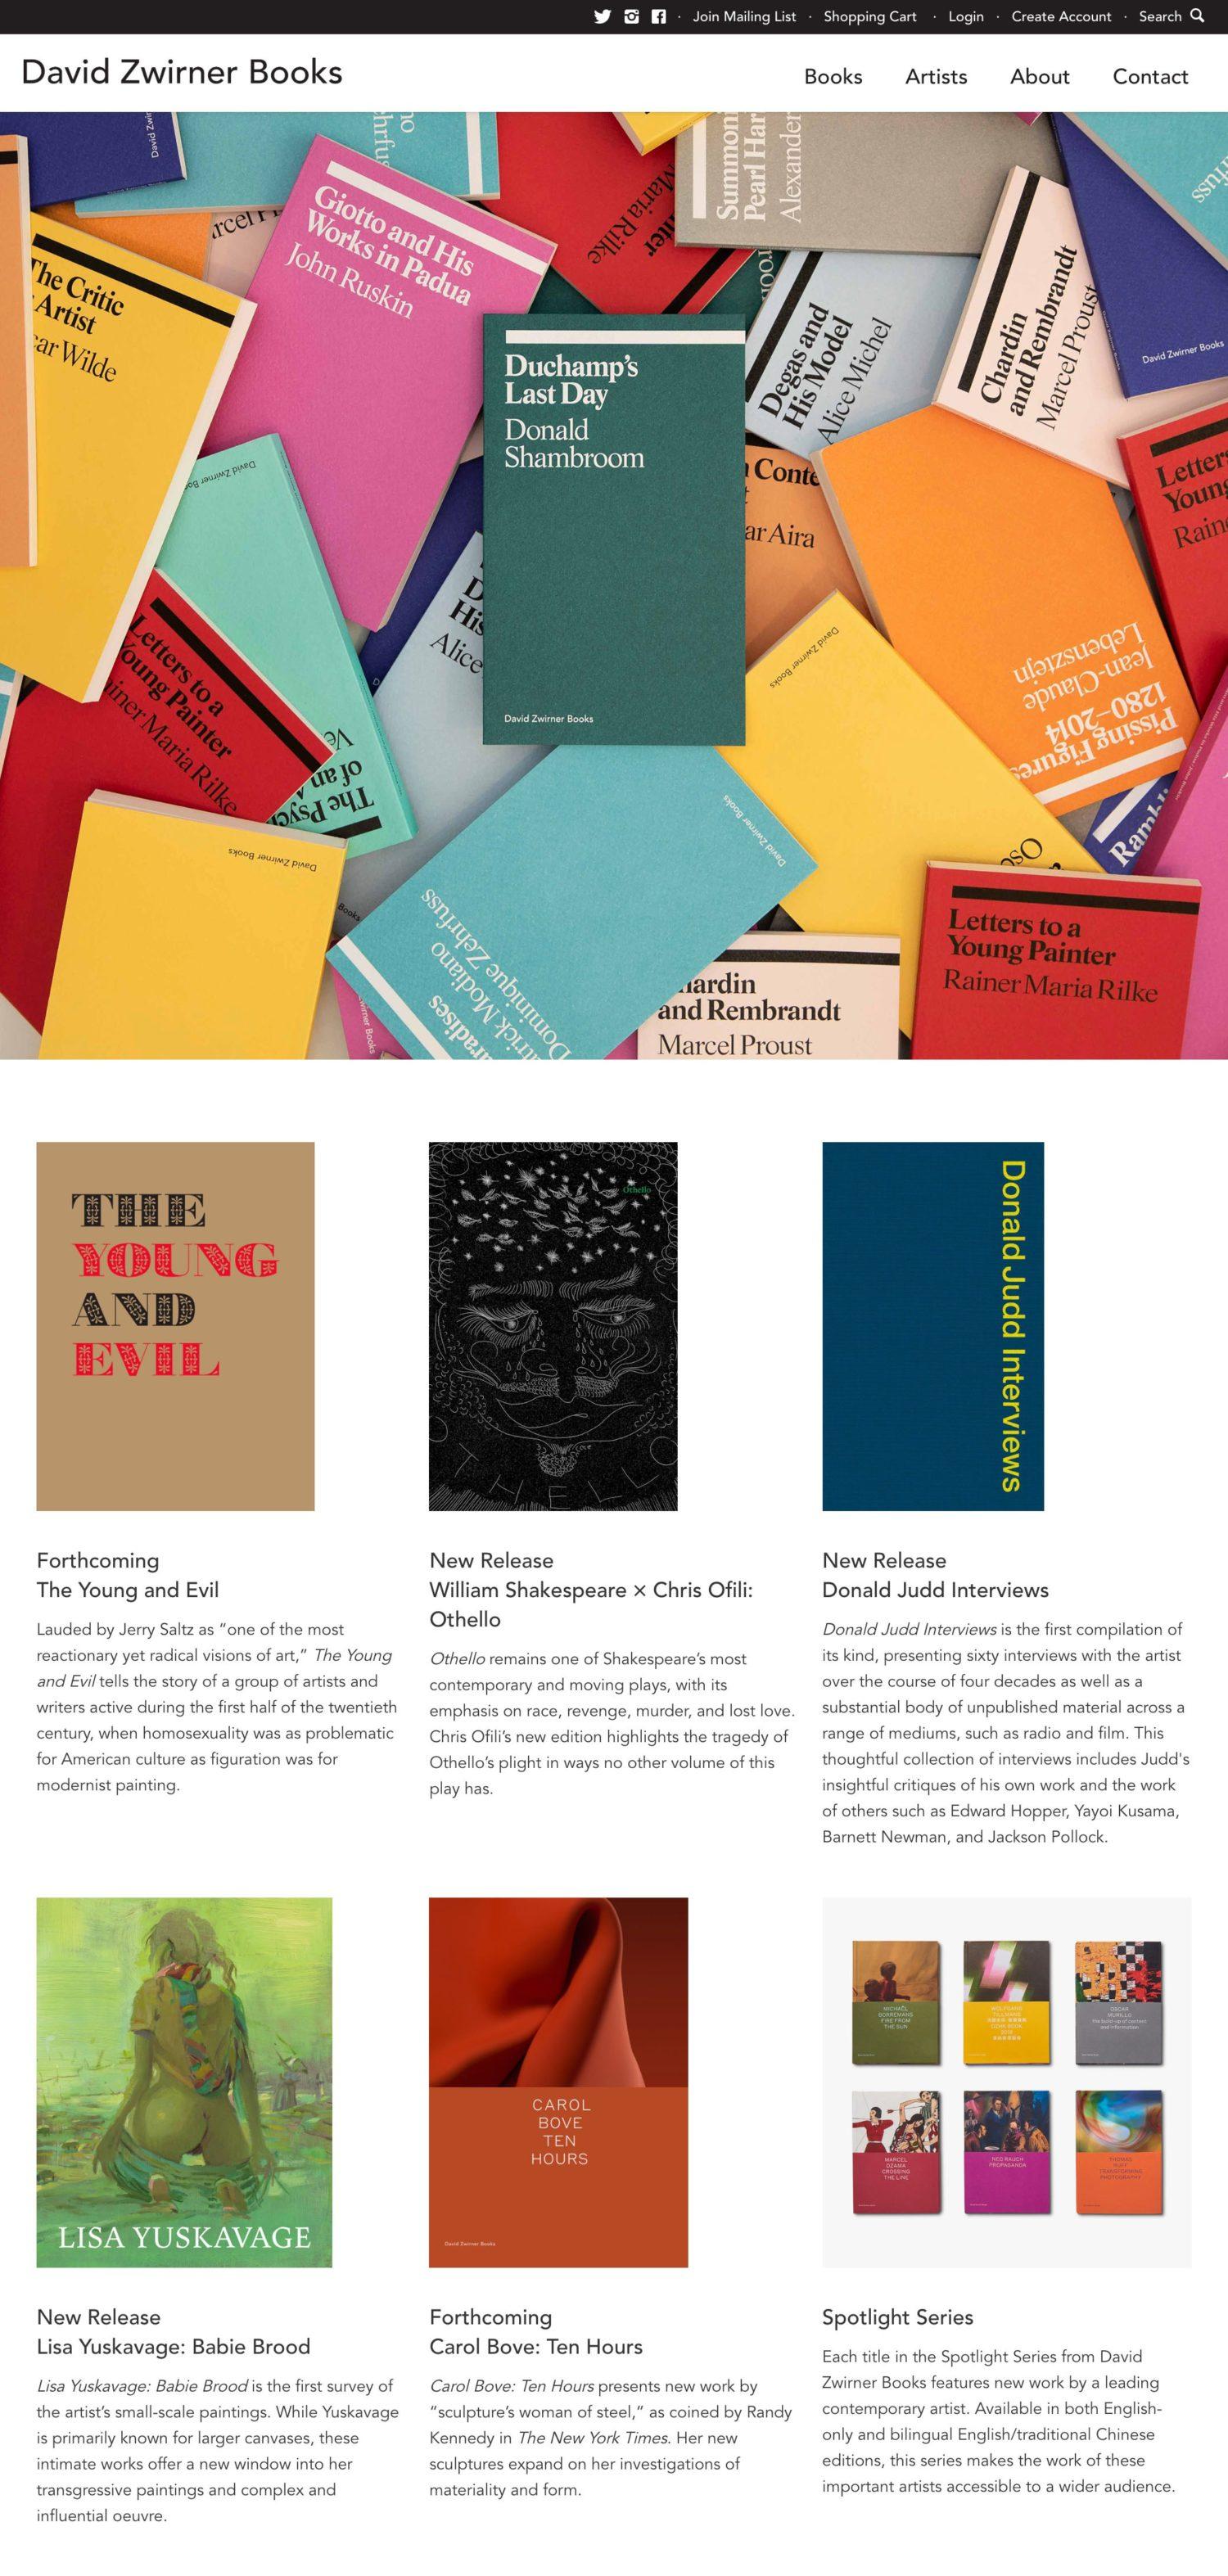 Screenshot of the David Zwirner Books website's homepage